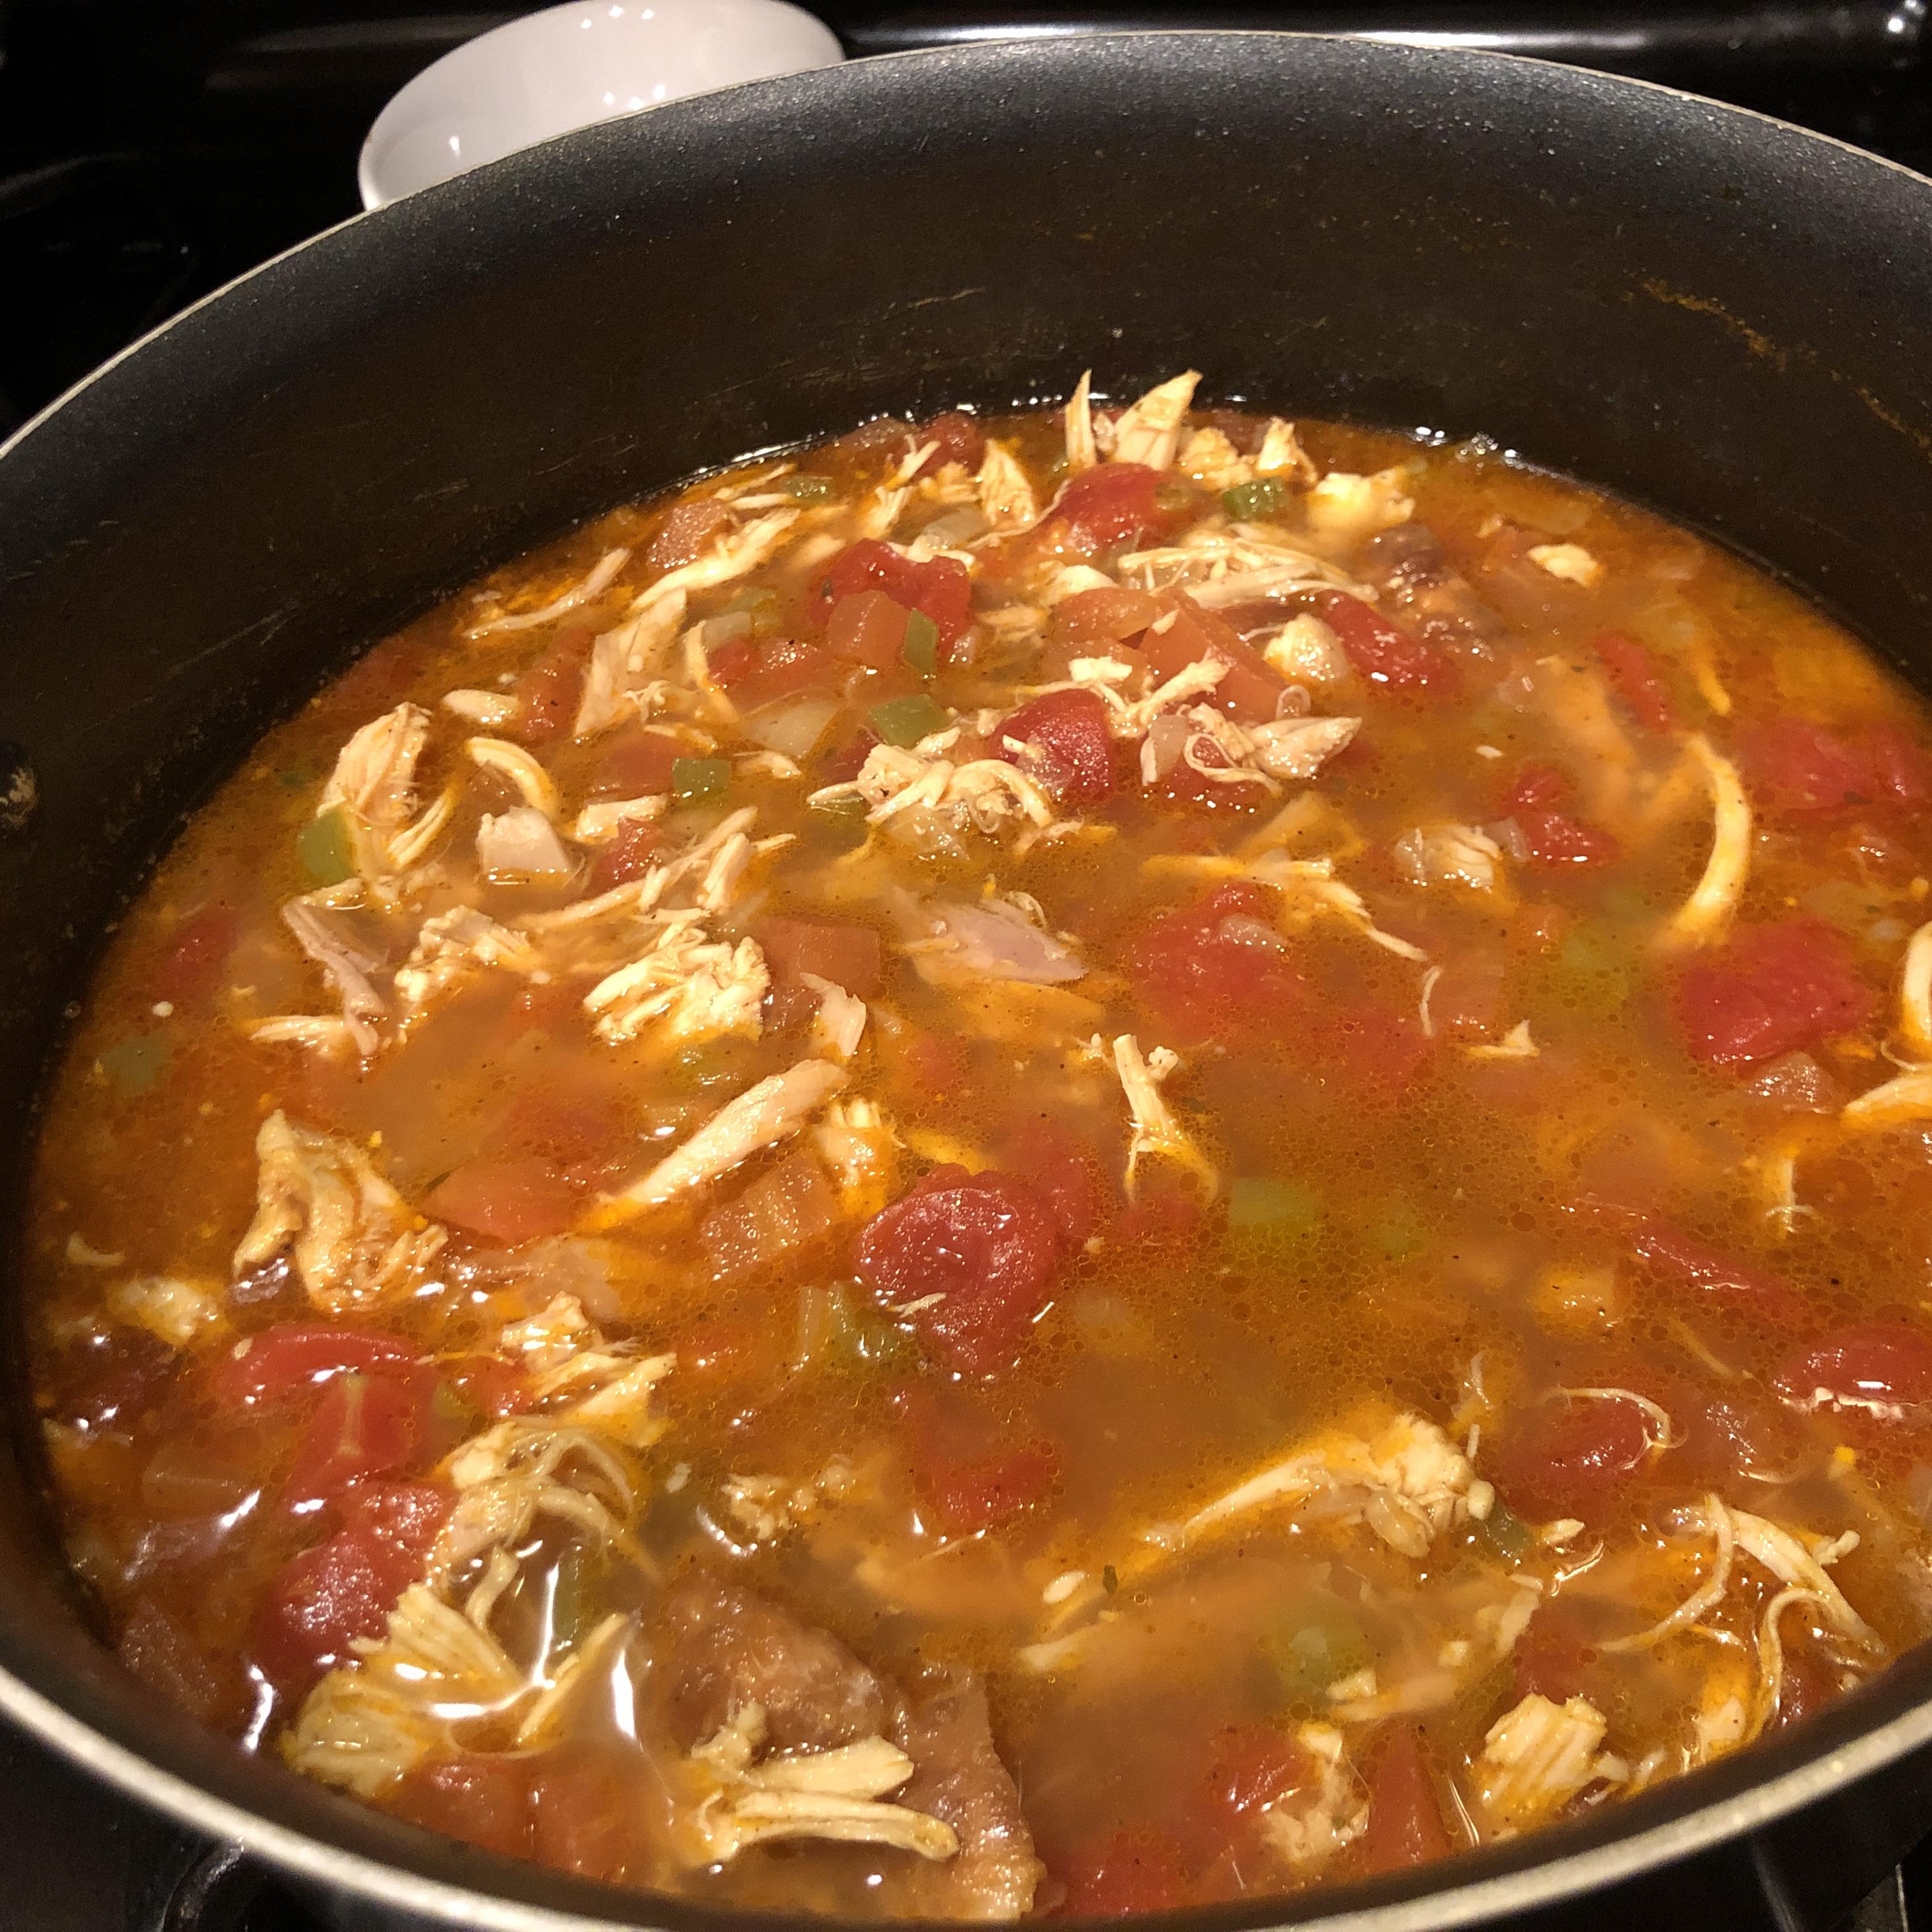 The World's Best Tortilla Soup Candice